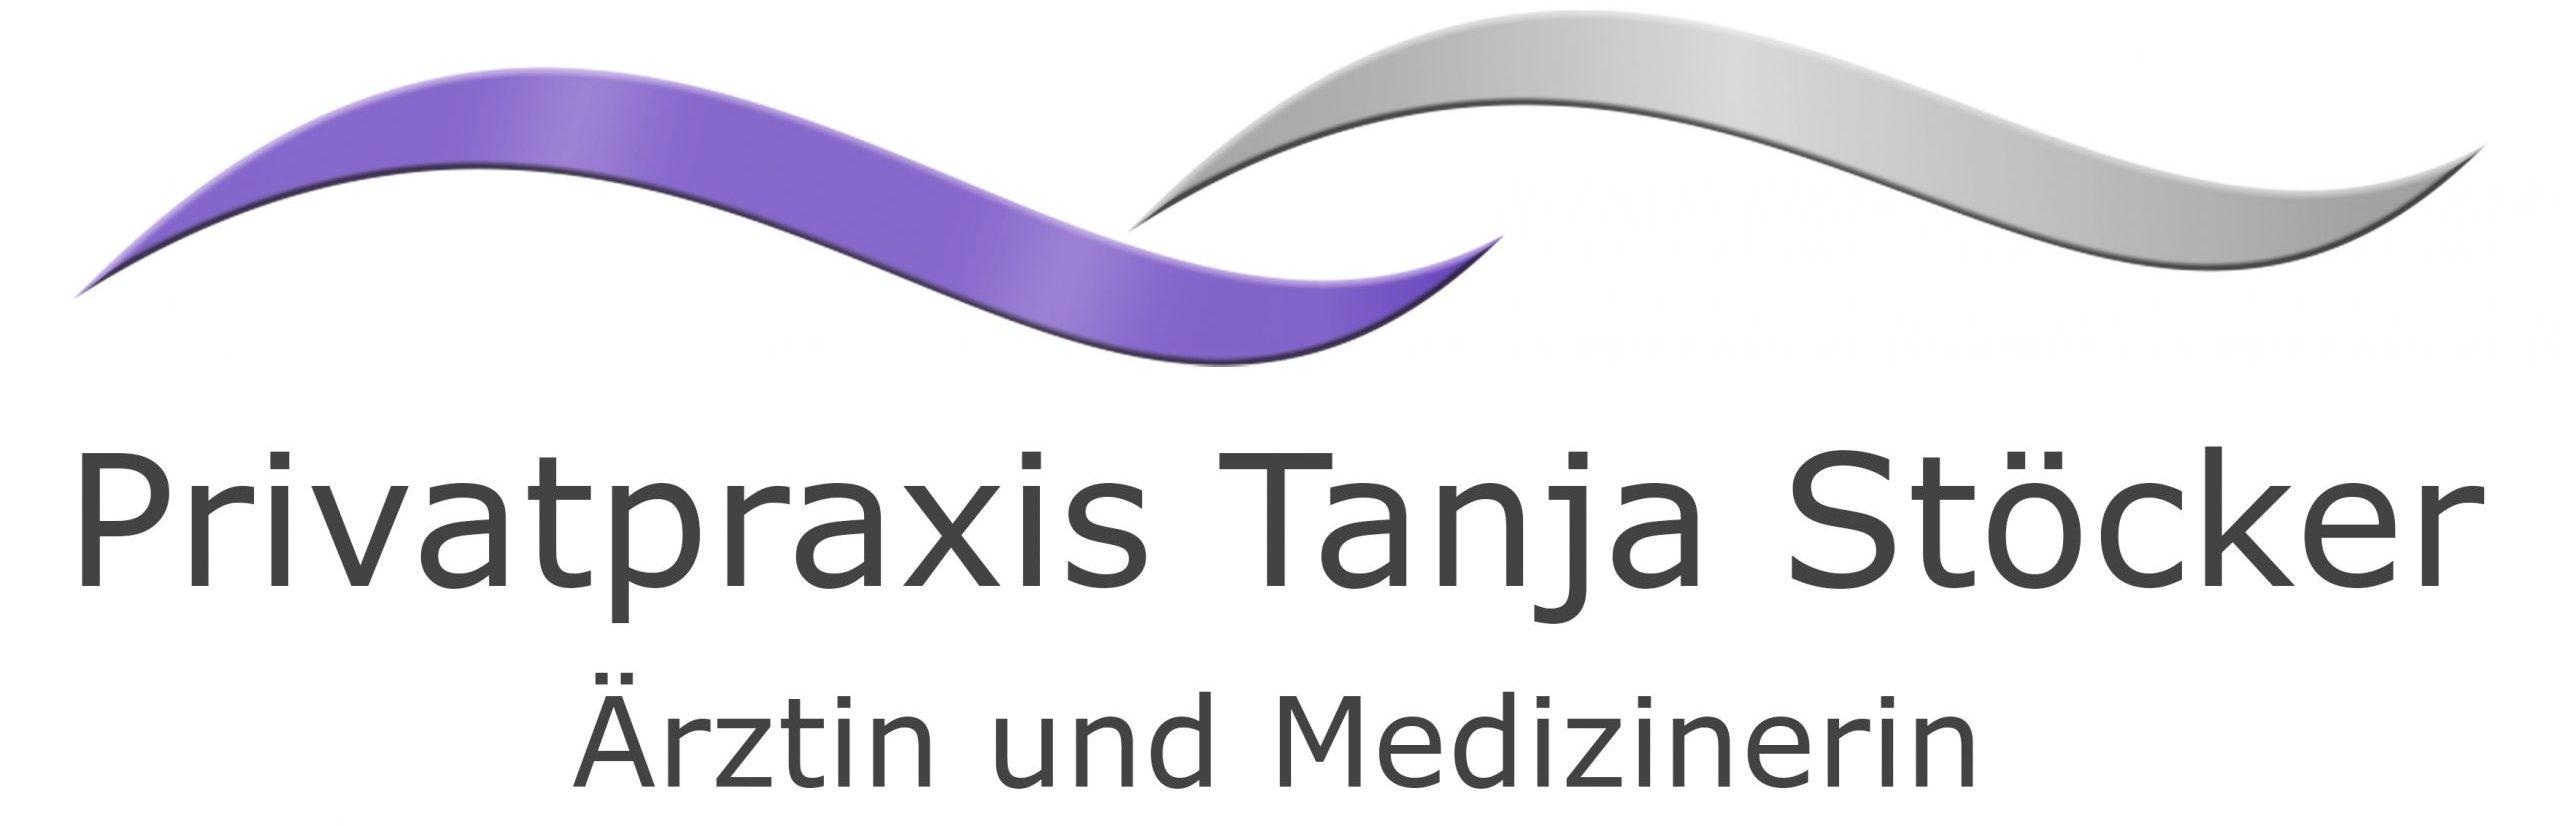 Privatpraxis Tanja Stöcker